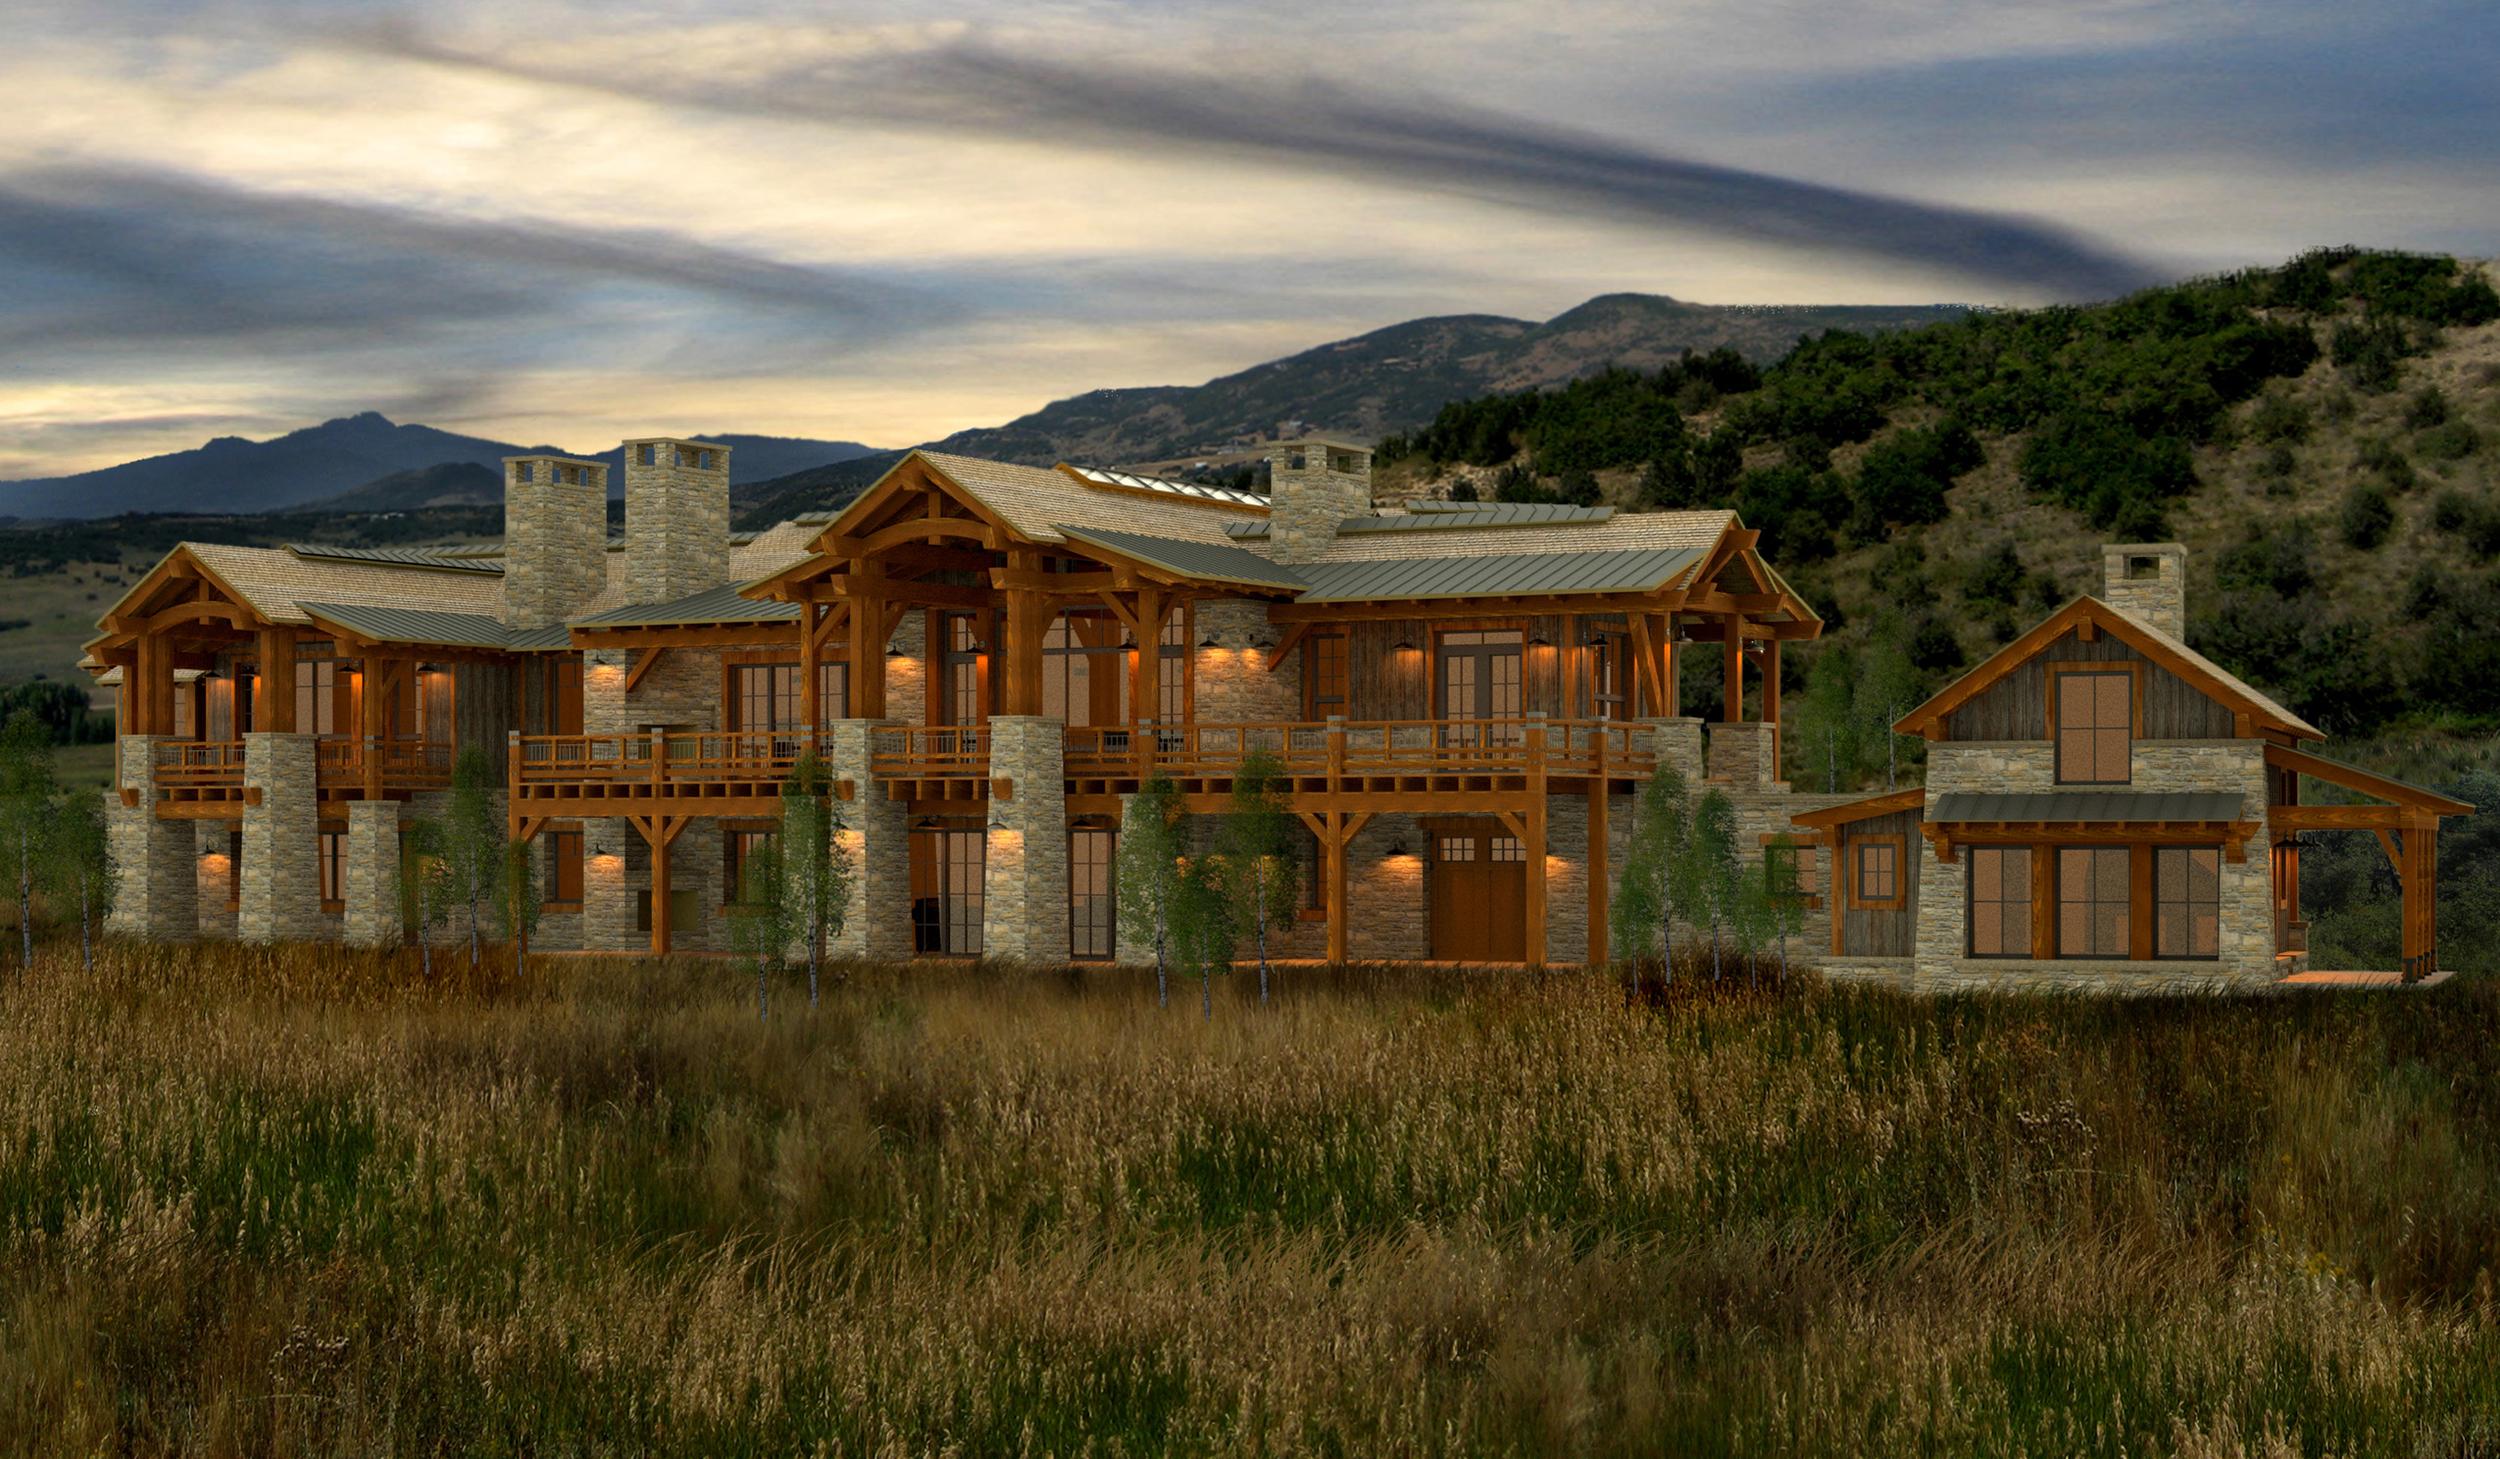 Colorado mountain ranch sustainable architect - 06.jpg